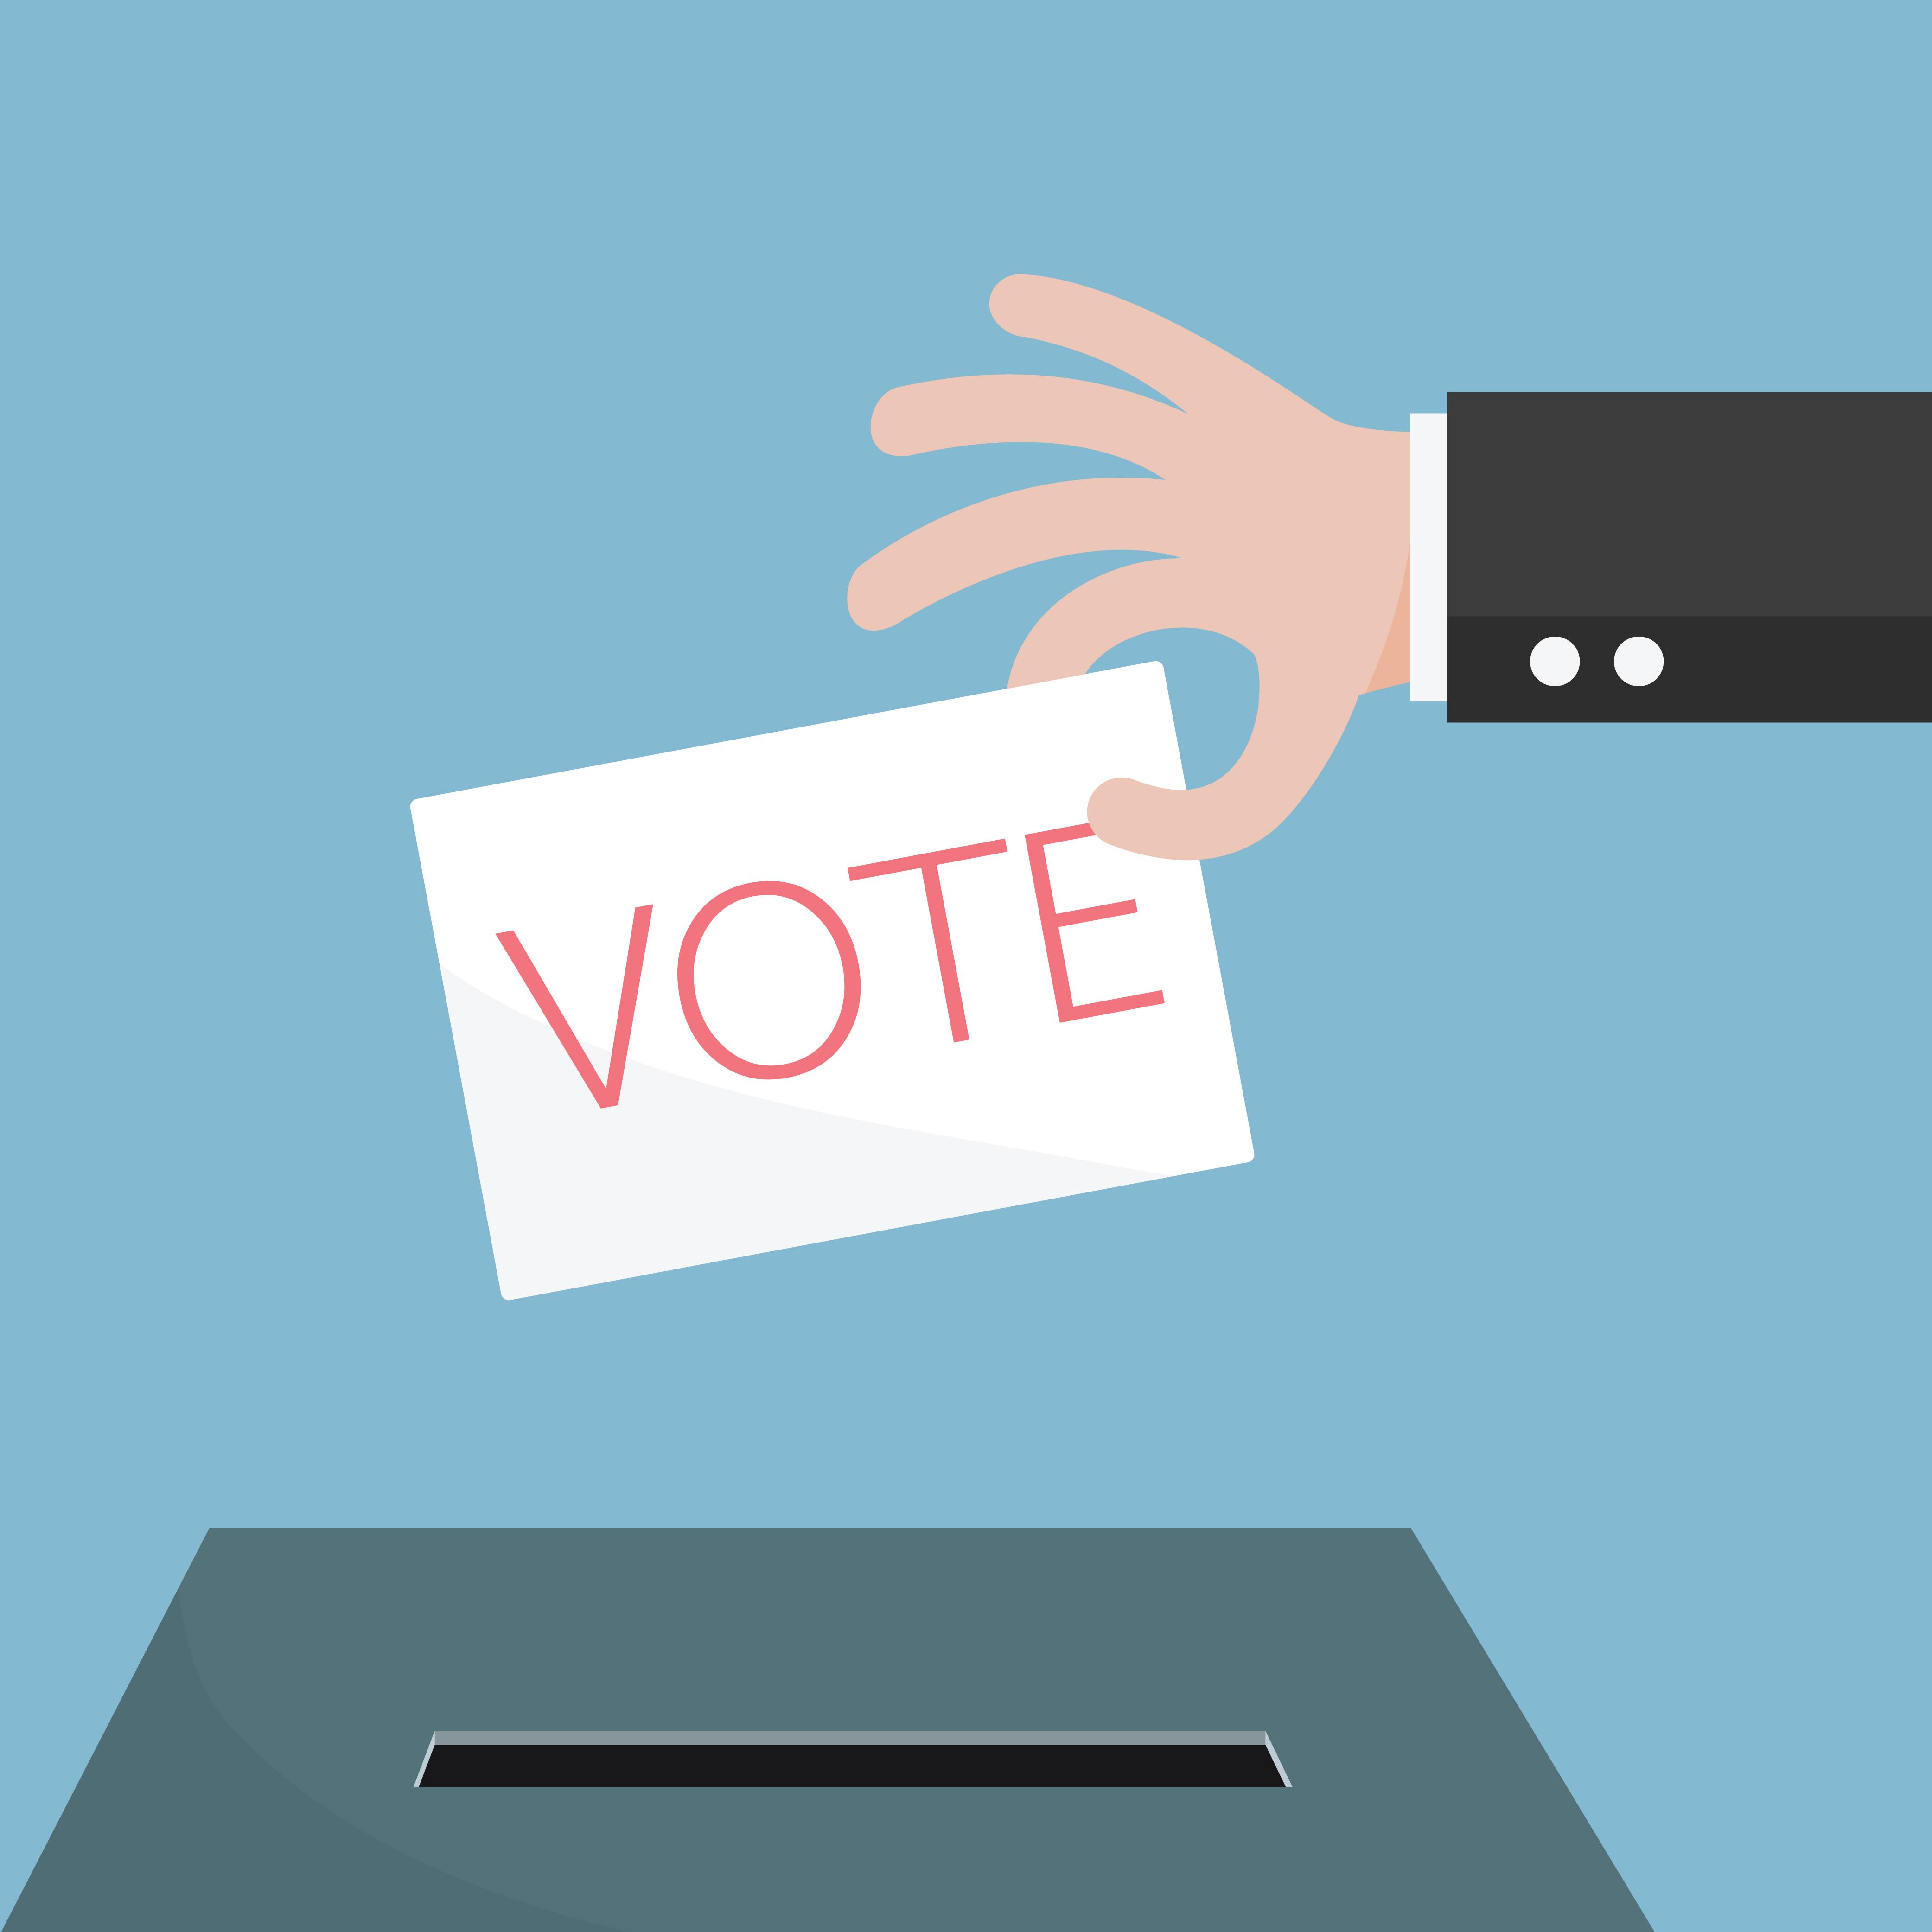 political referendum